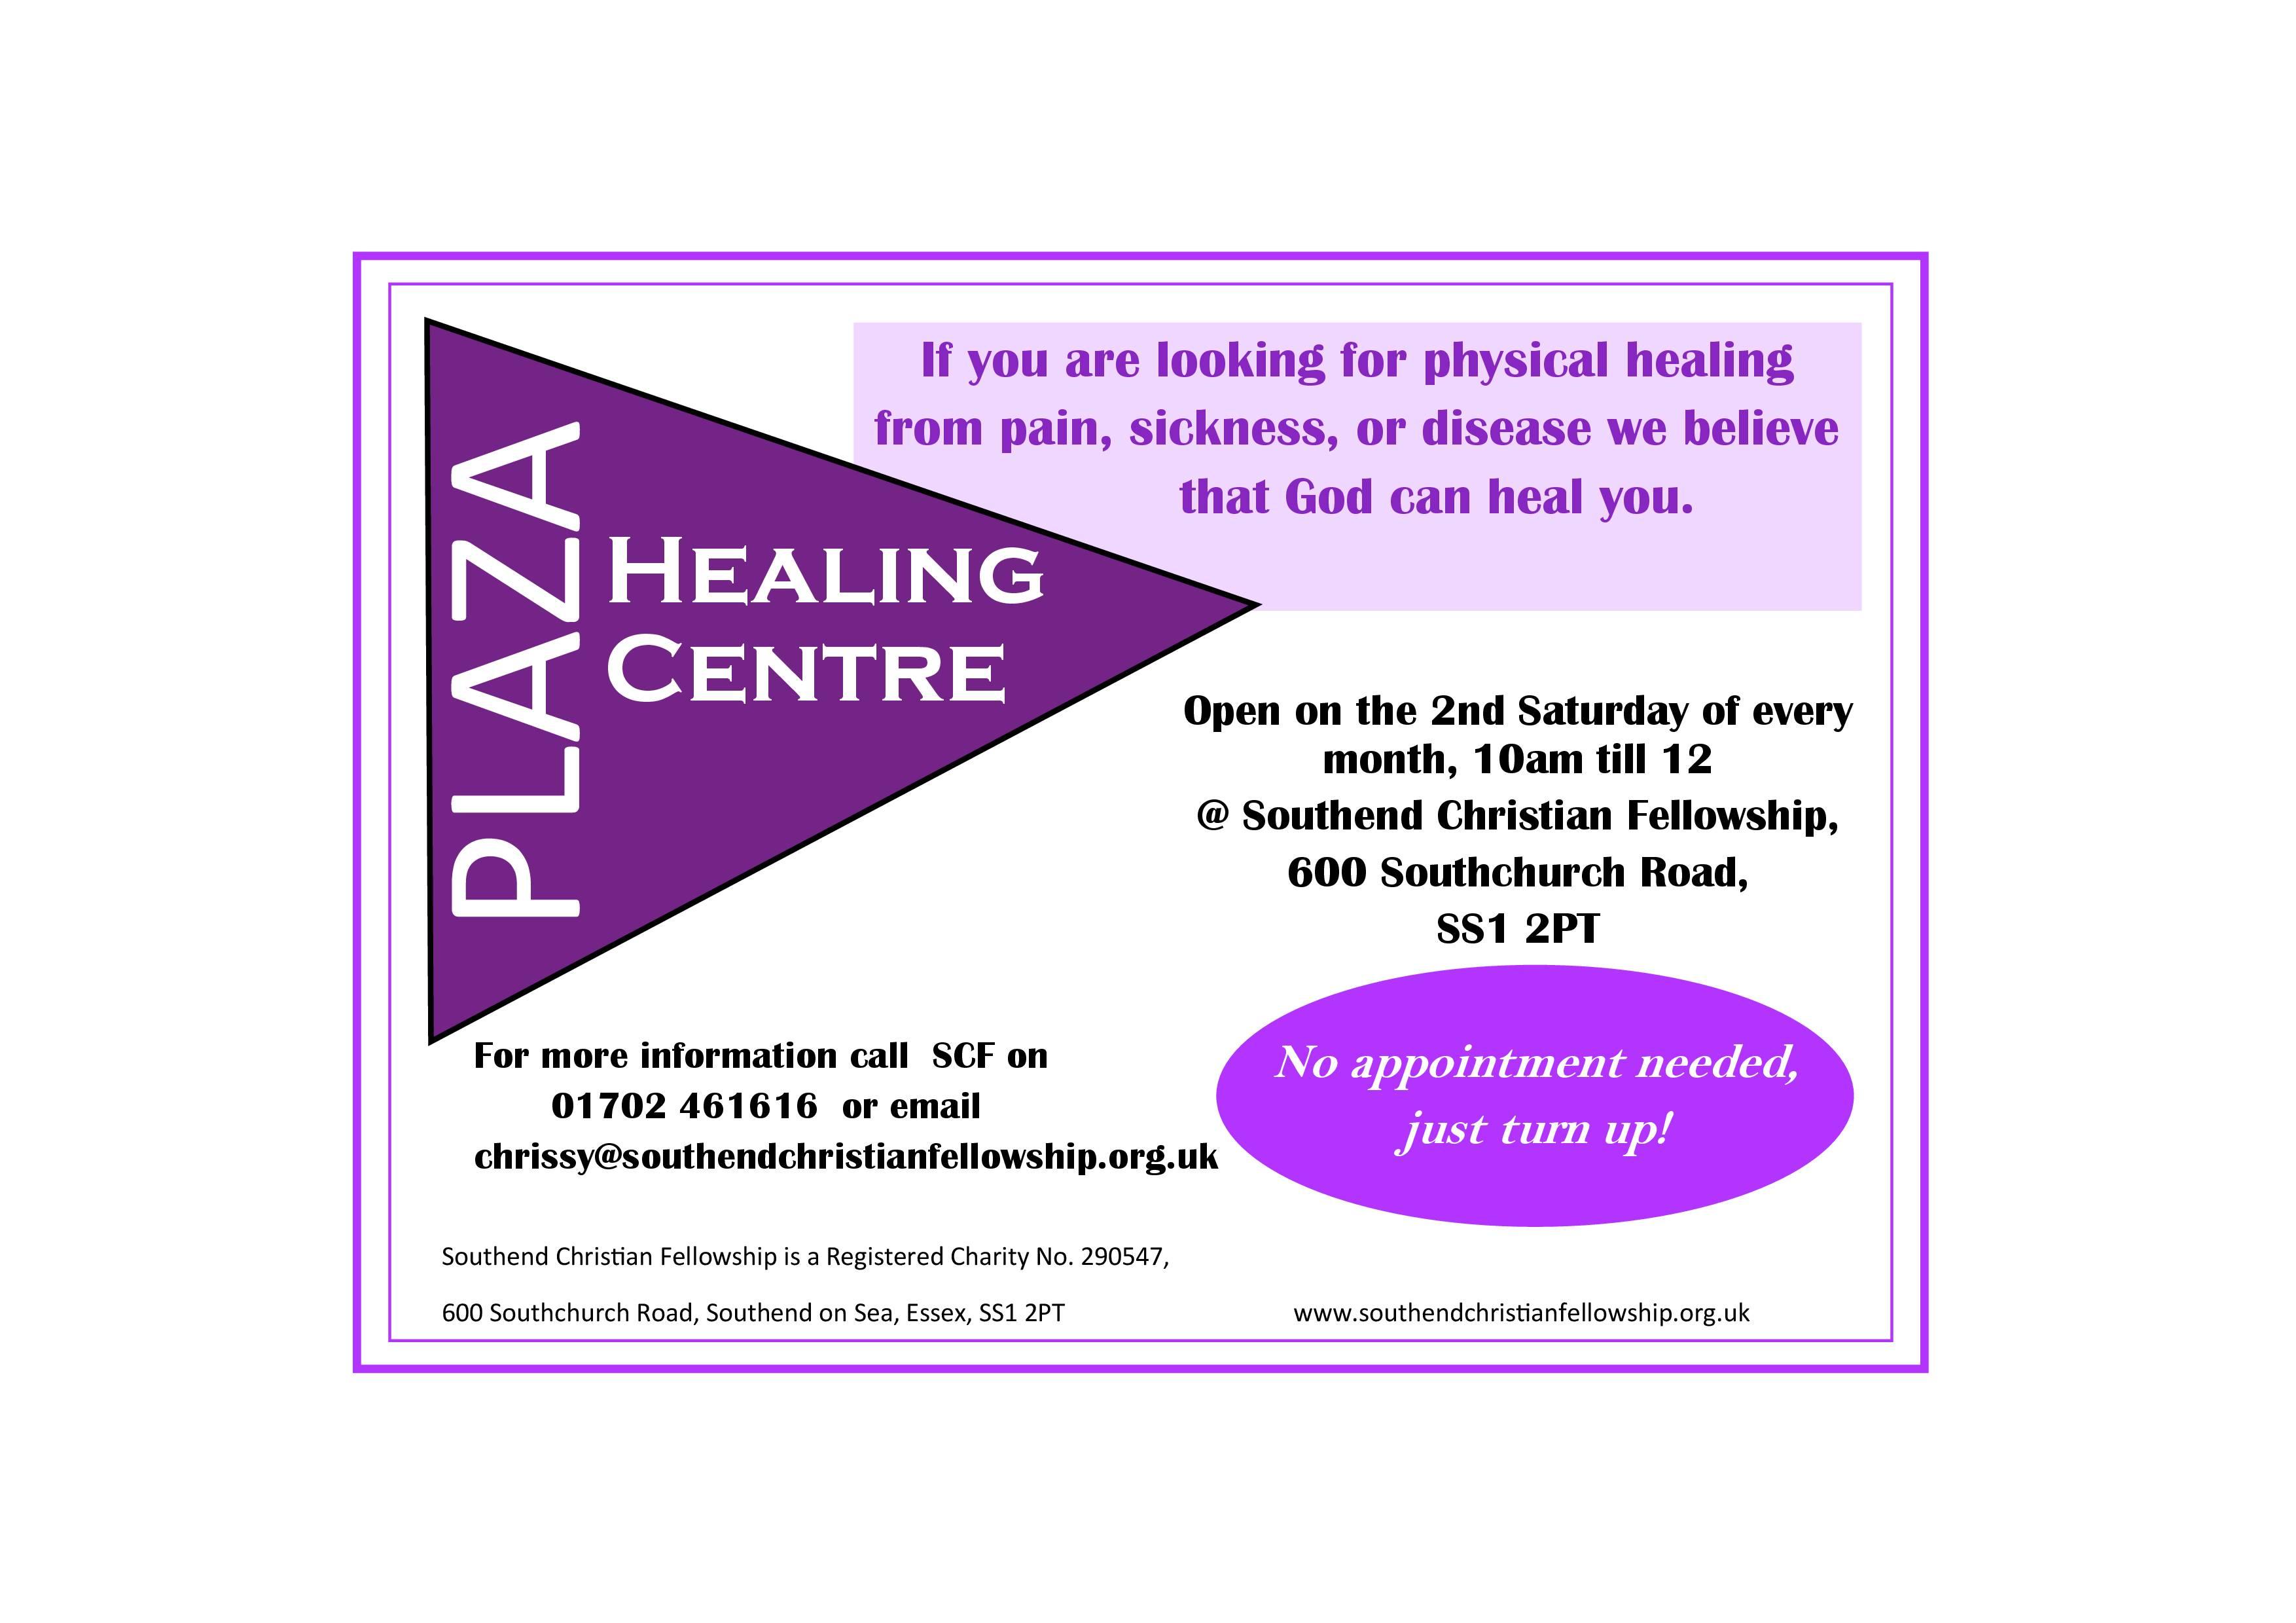 Plaza Healing Centre